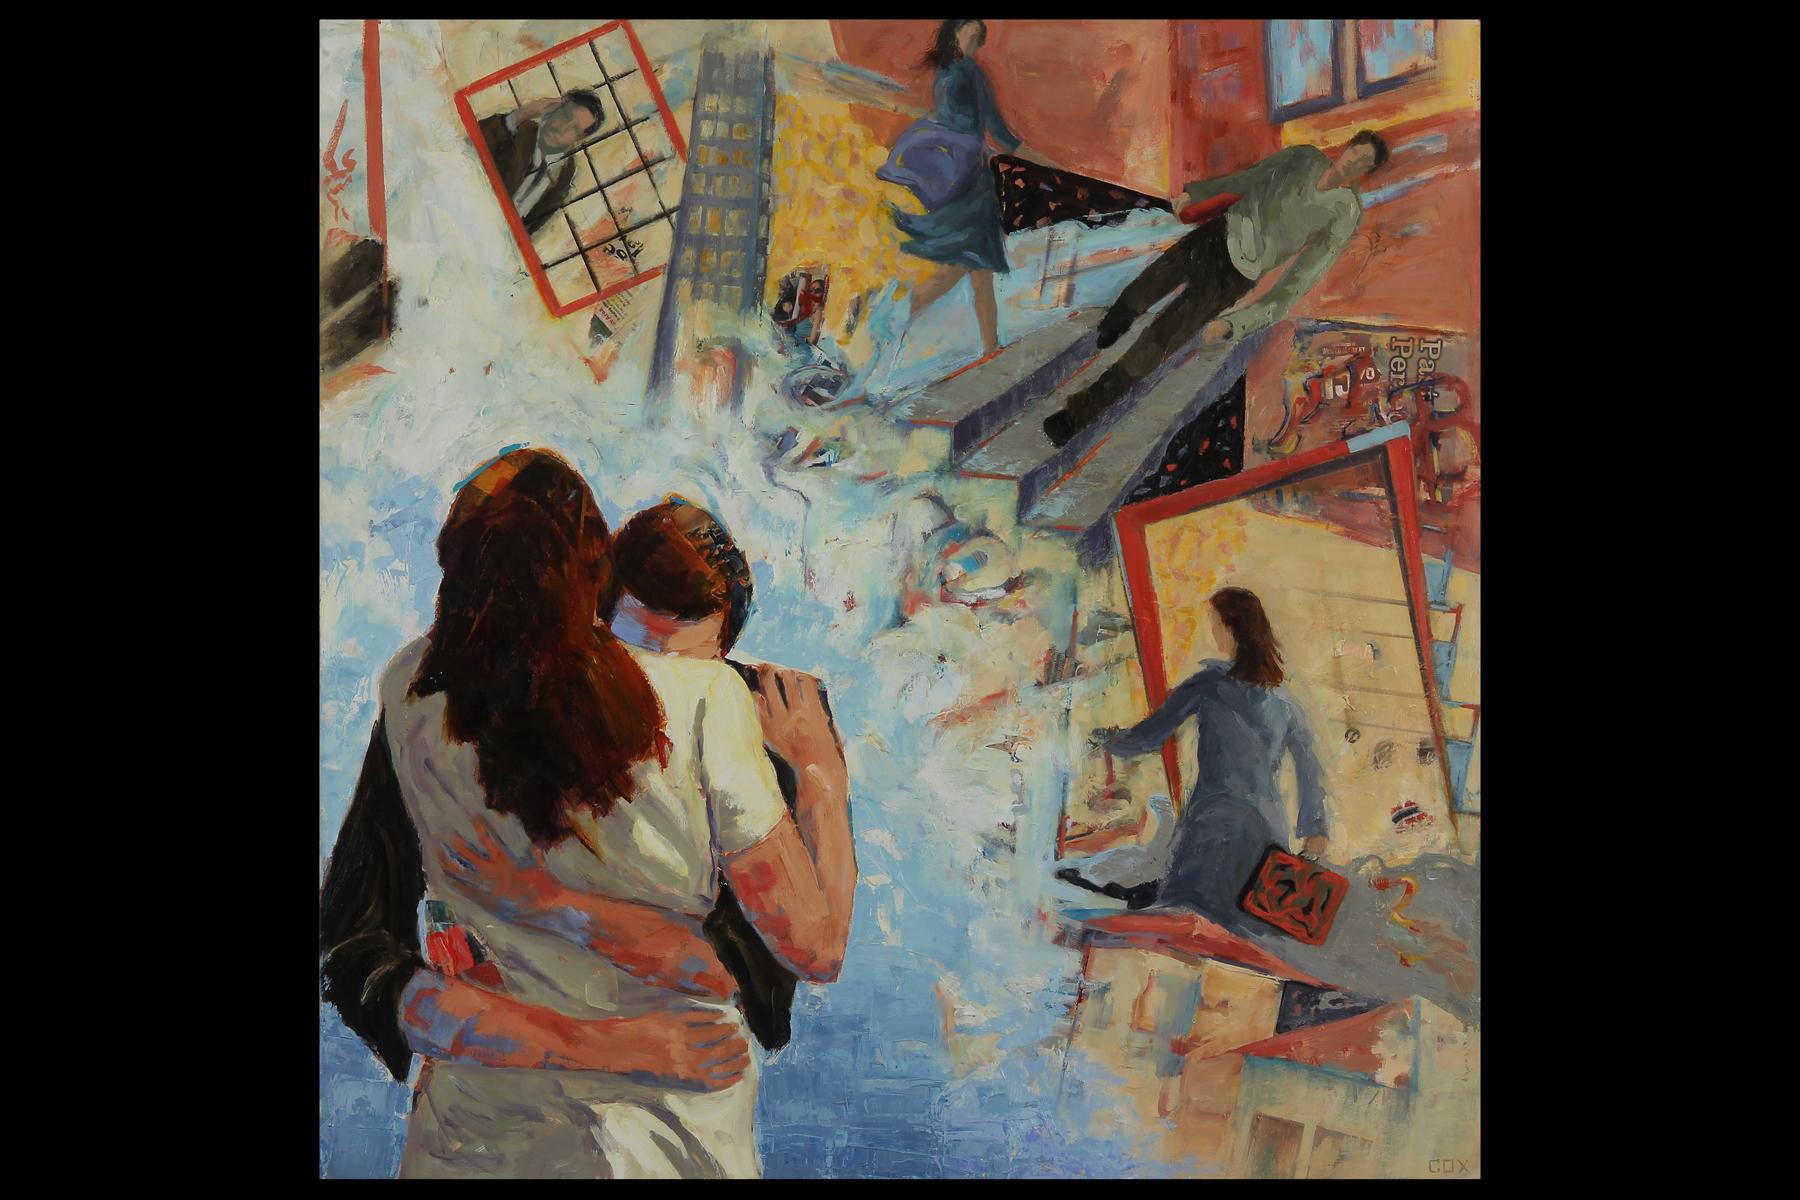 SECOND PLACE  - Marcia Cox | Momentito Por Amor | Oil, Acrylic, and Paper on Canvas